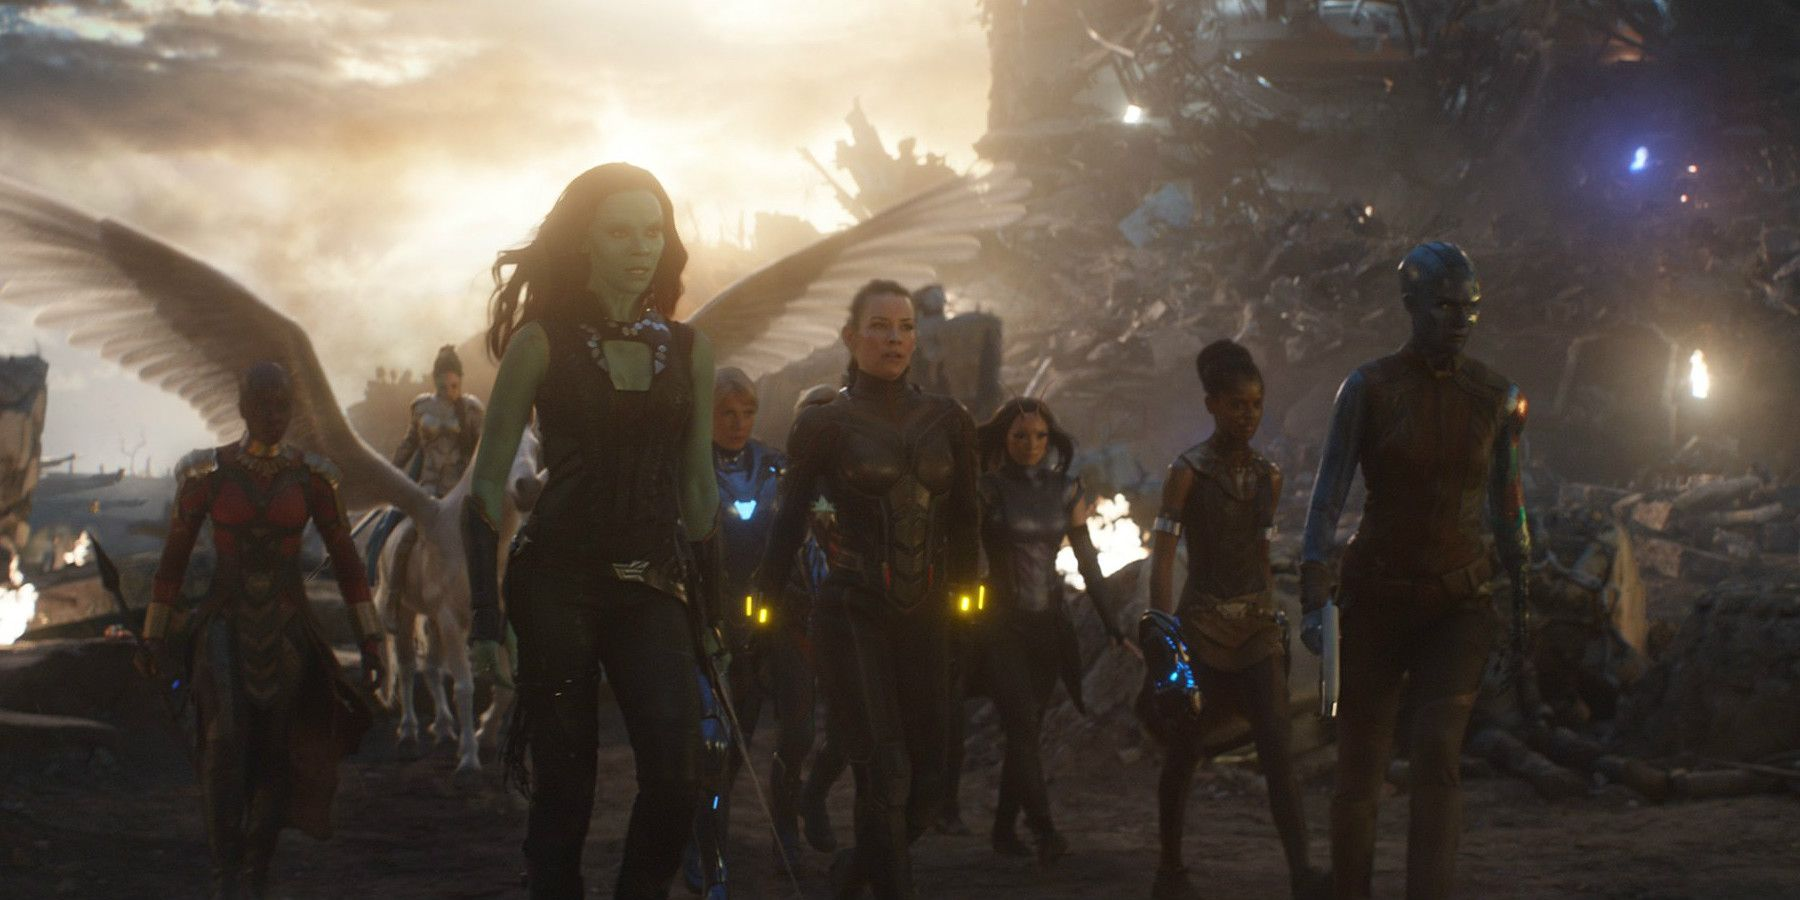 Endgame: Marvel's Female Heroes Reflect On A-Force Scene